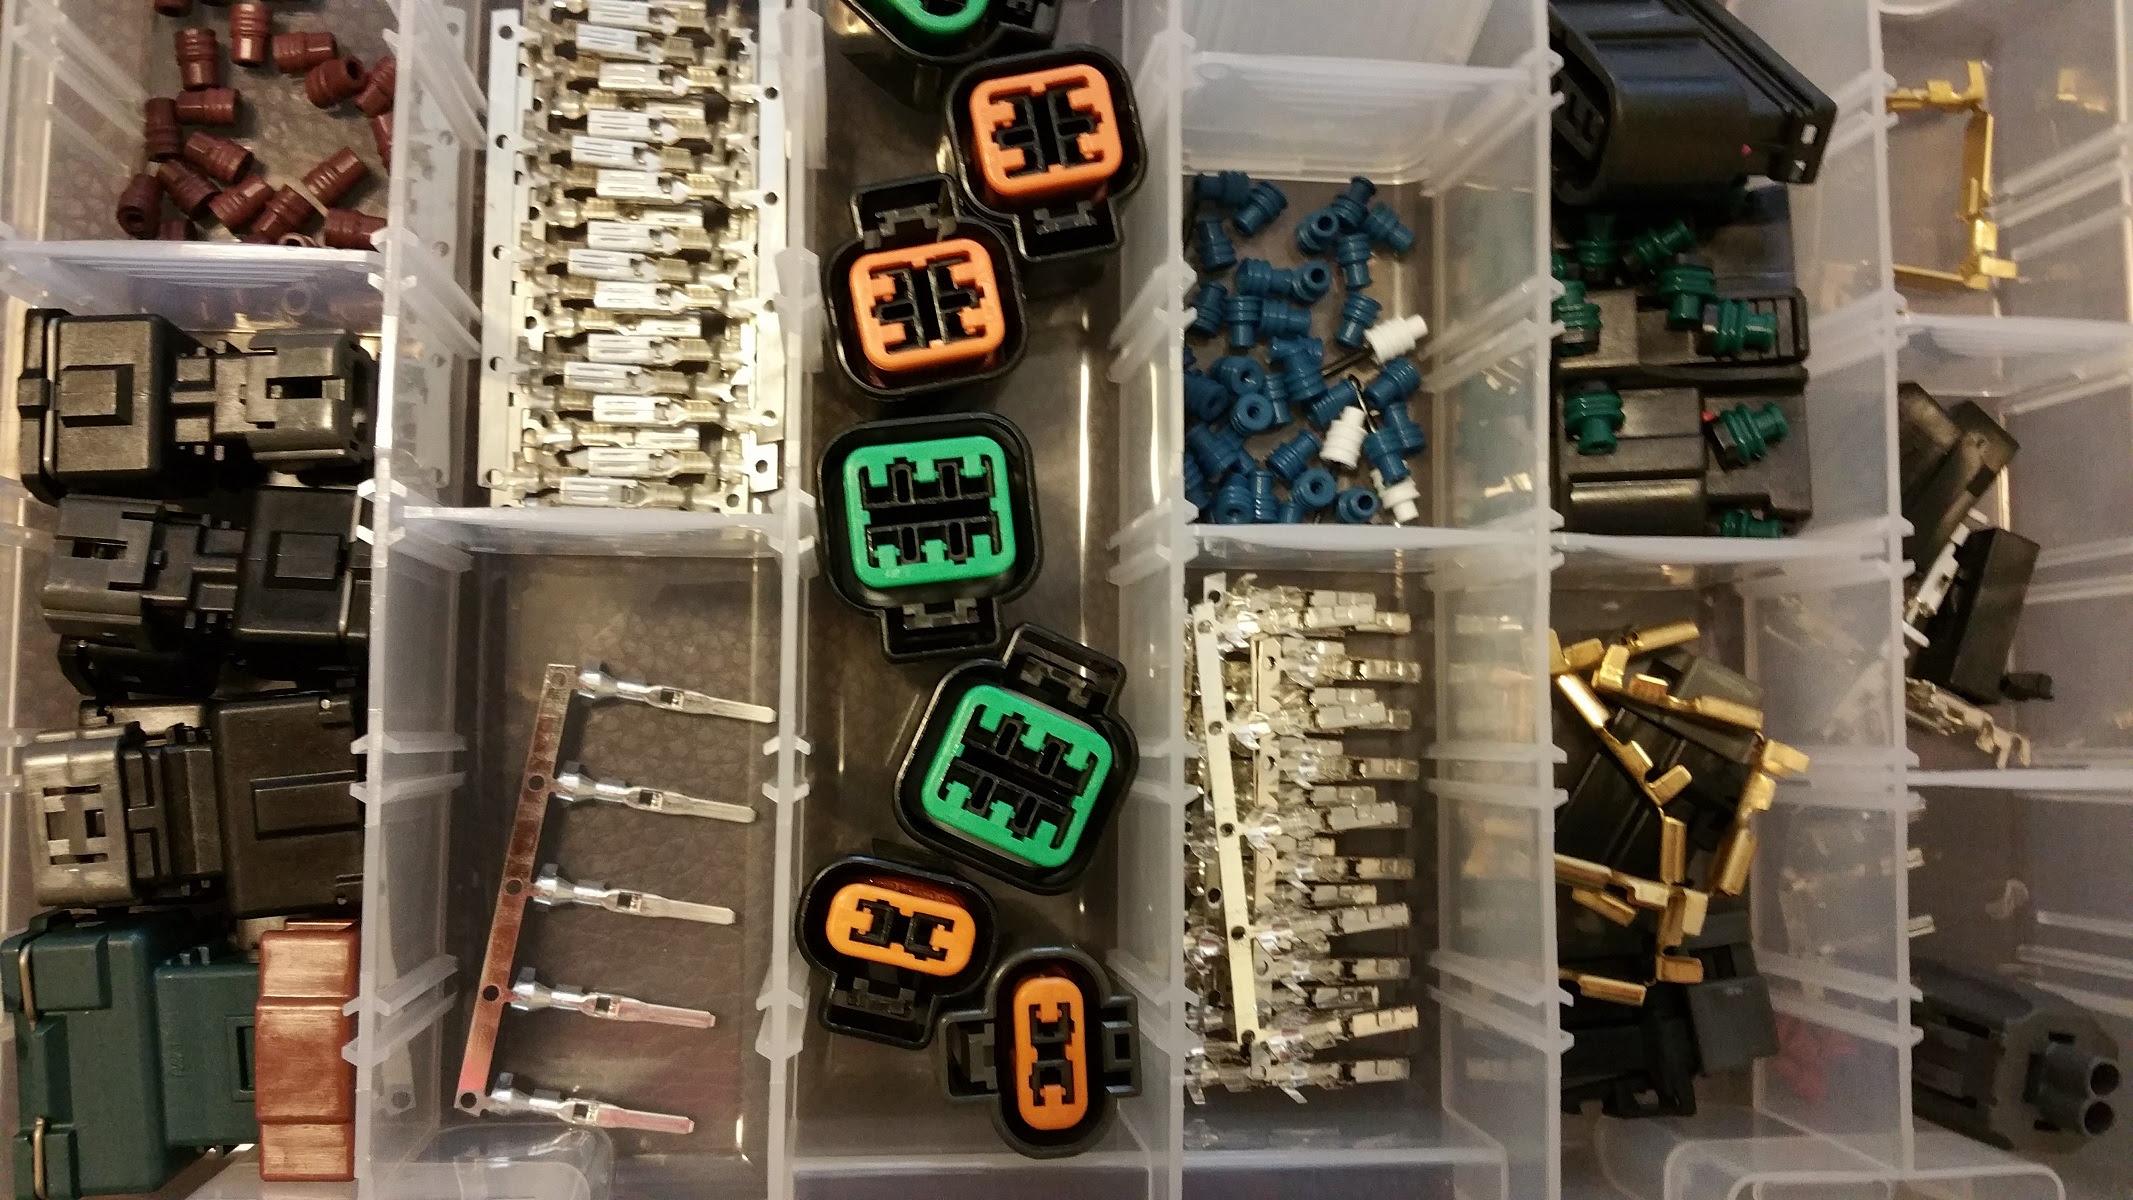 9d68 Wiring Harness 1g To 2g Dsm Cas Wiring Resources